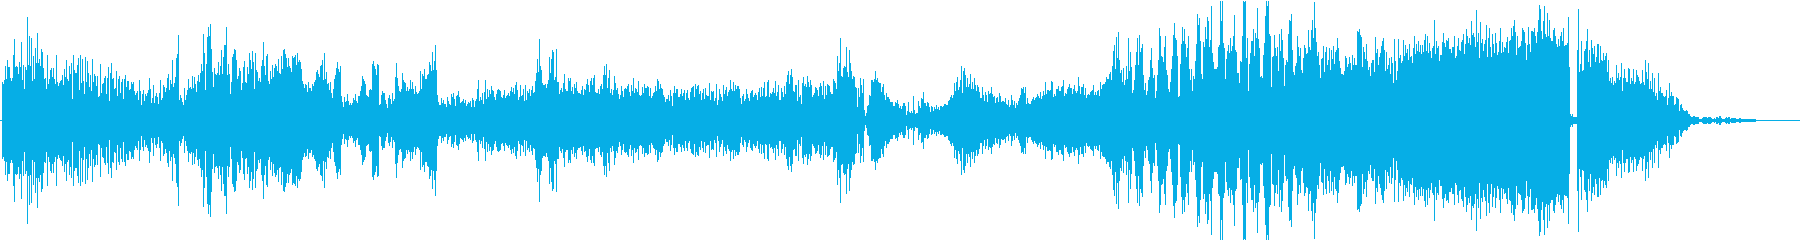 FMラジオ的ジングル2の再生済みの波形